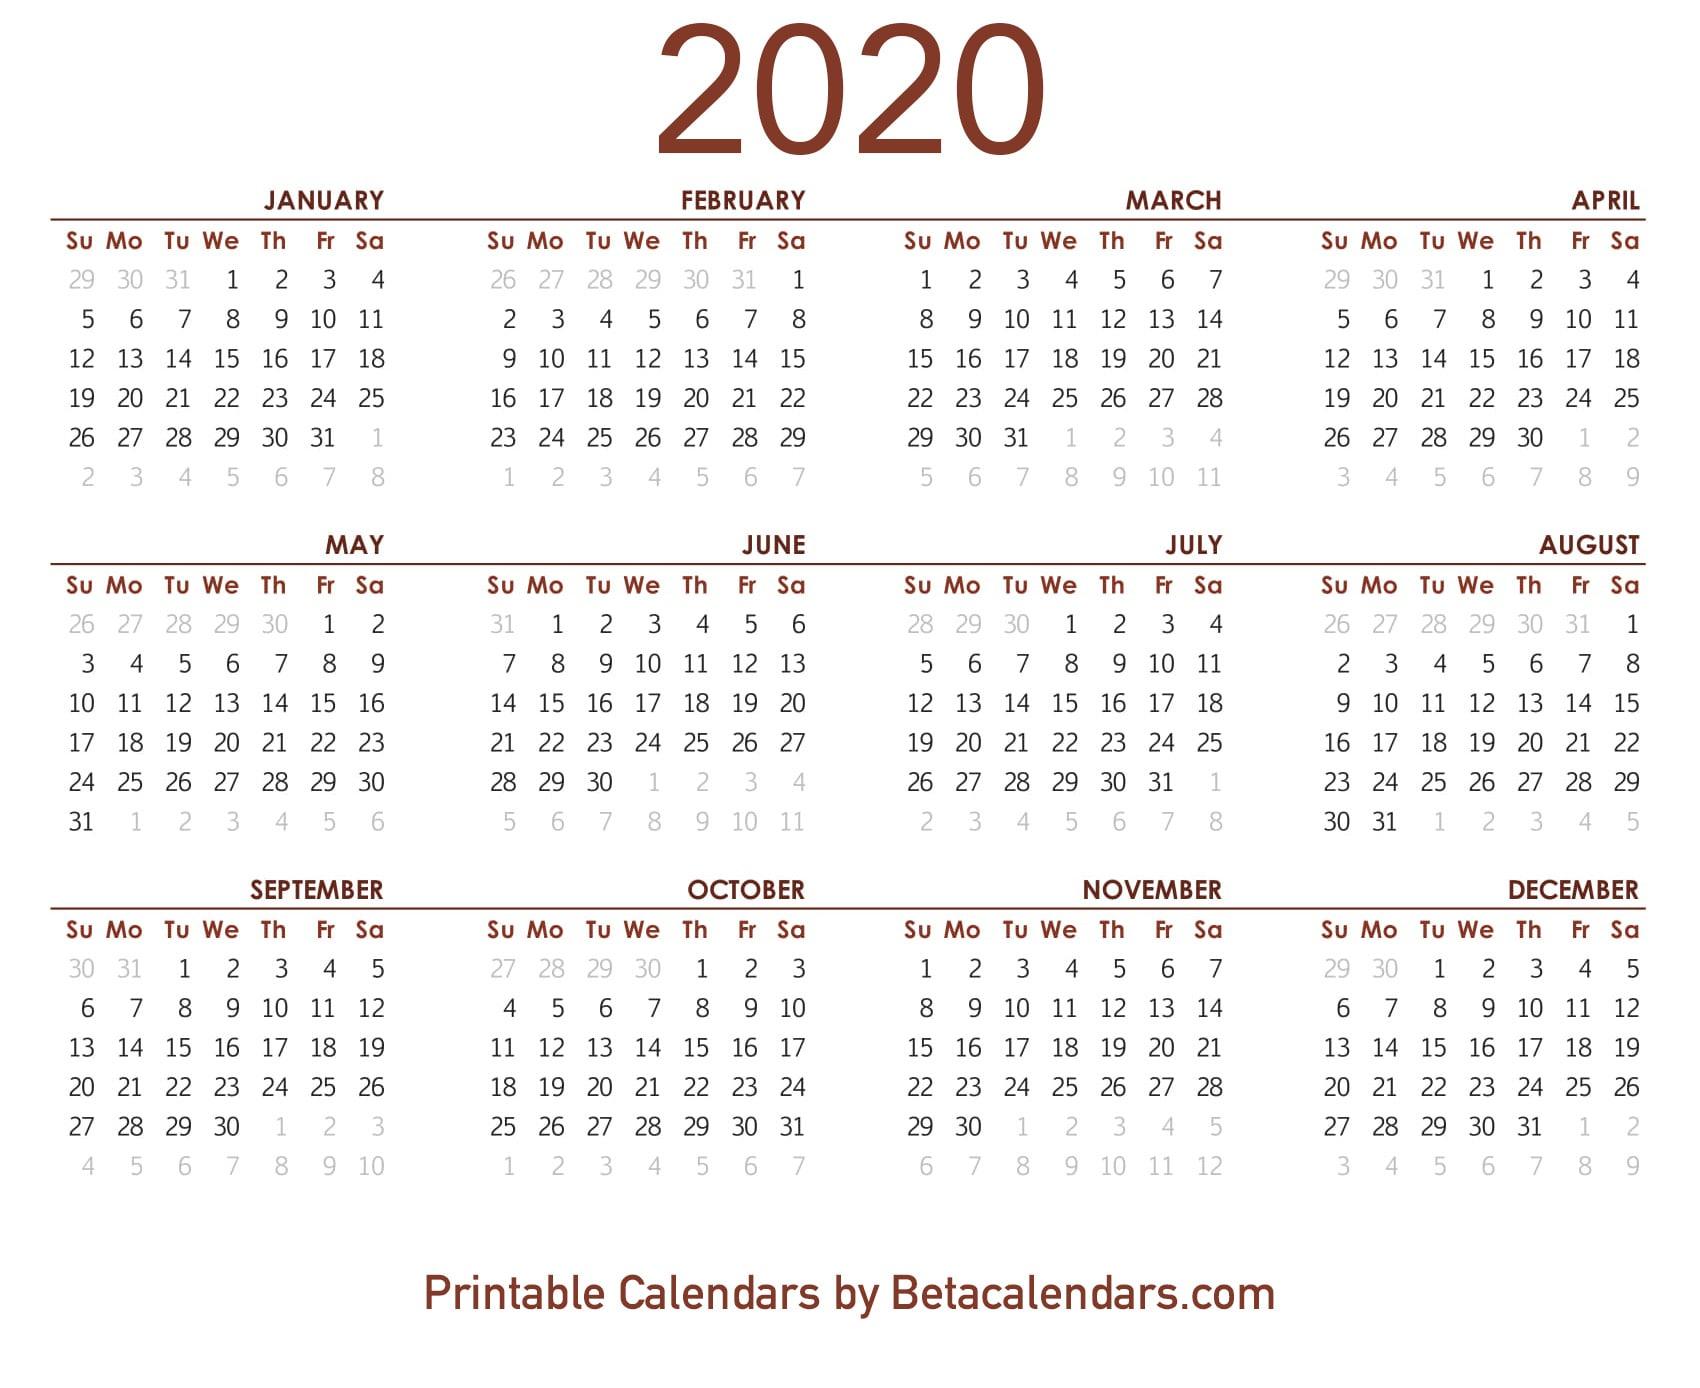 2020 Calendar - Beta Calendars pertaining to Calendar To Type On 2019 - 2020